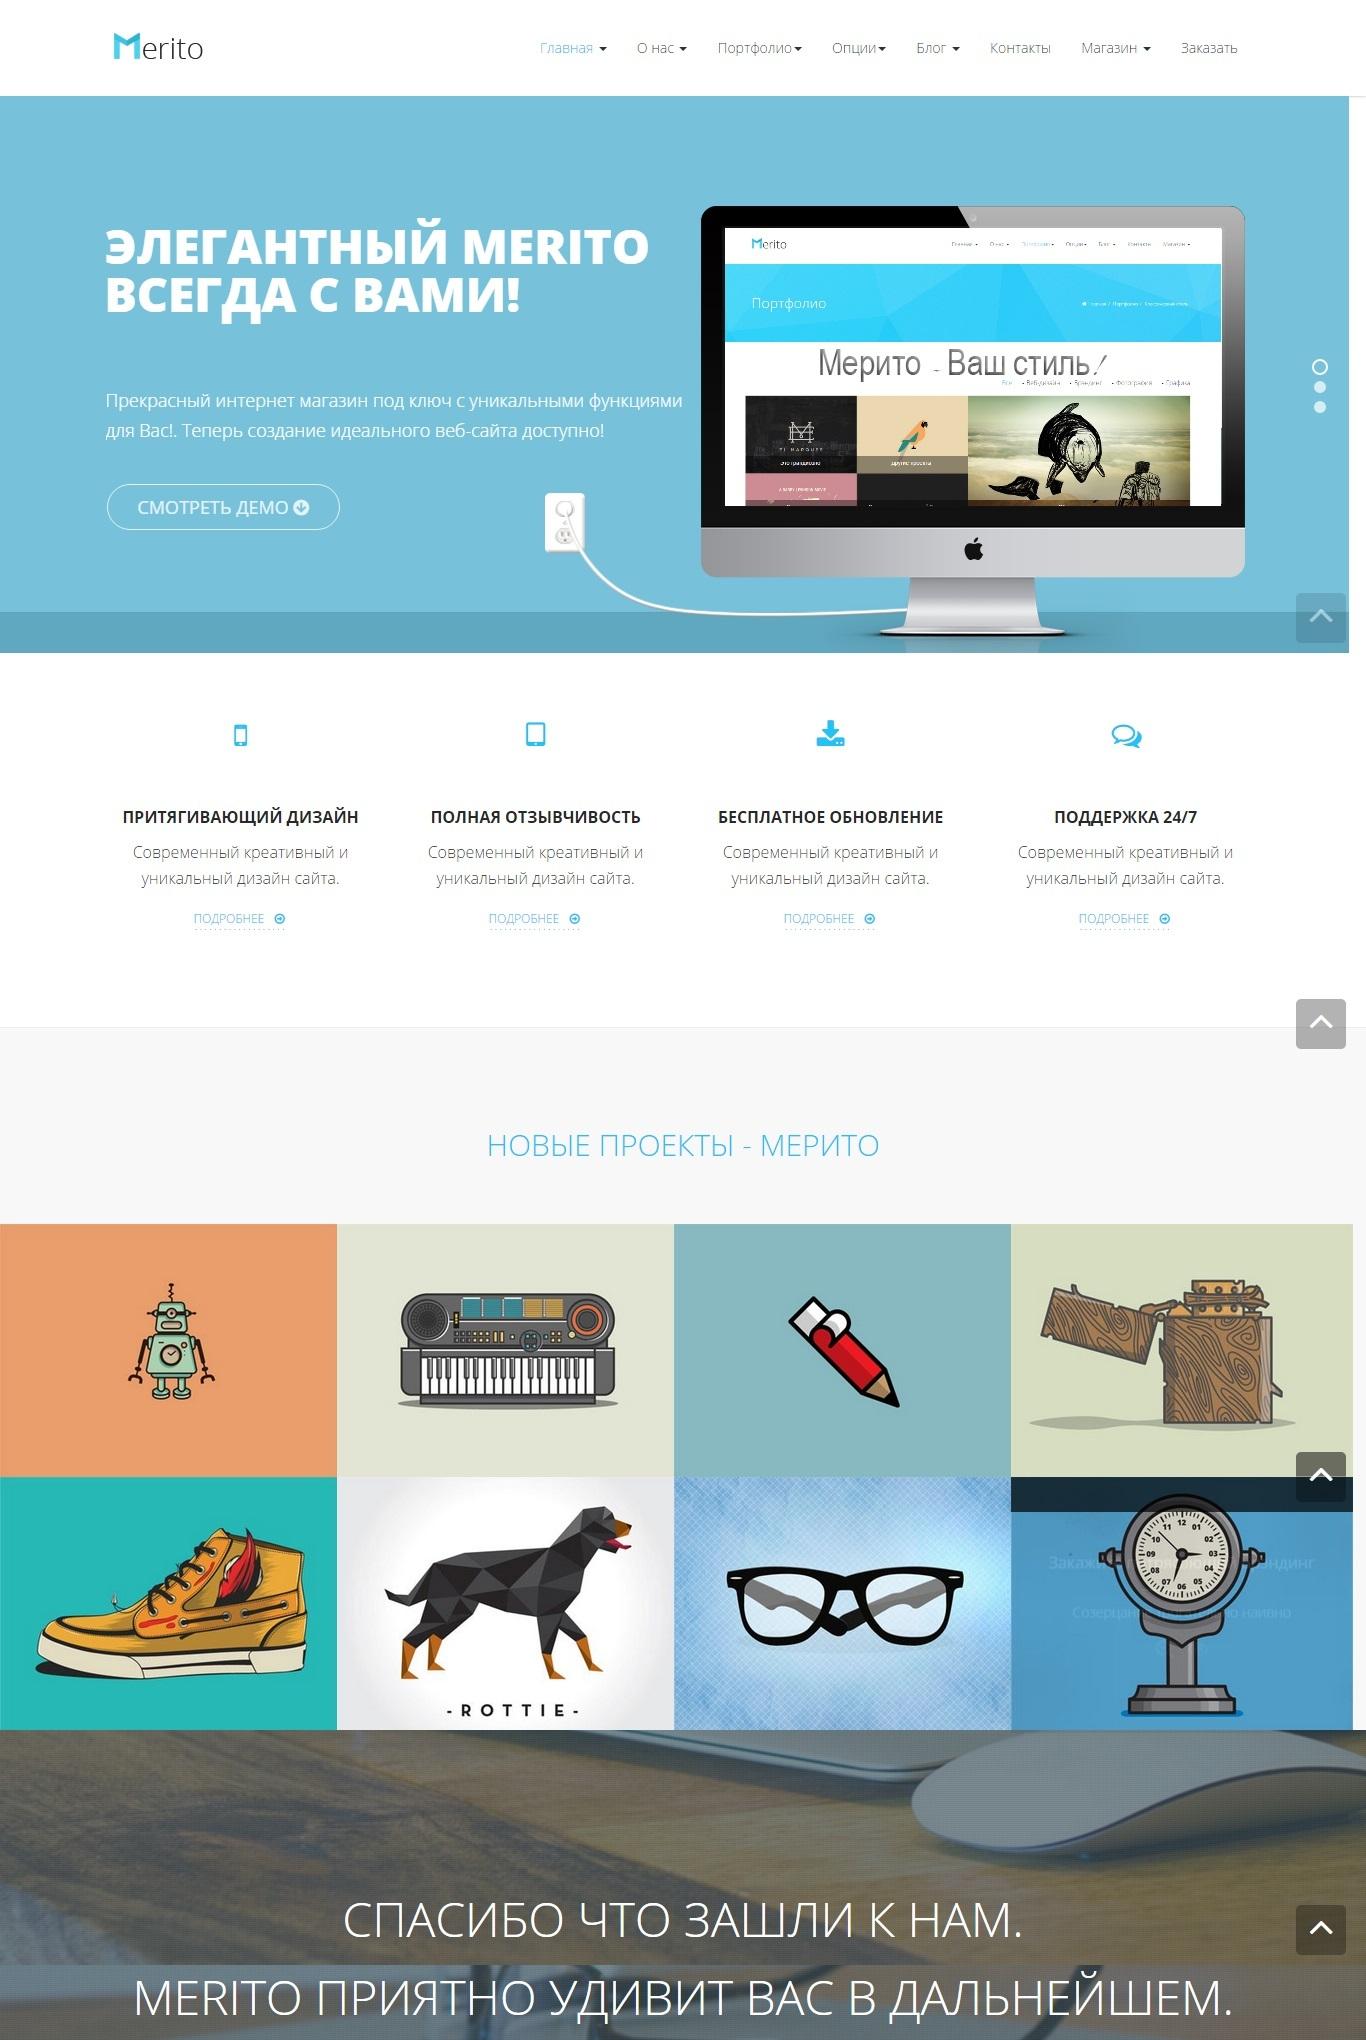 Создание интернет магазин на 1с битрикс цена битрикс портал с ответами